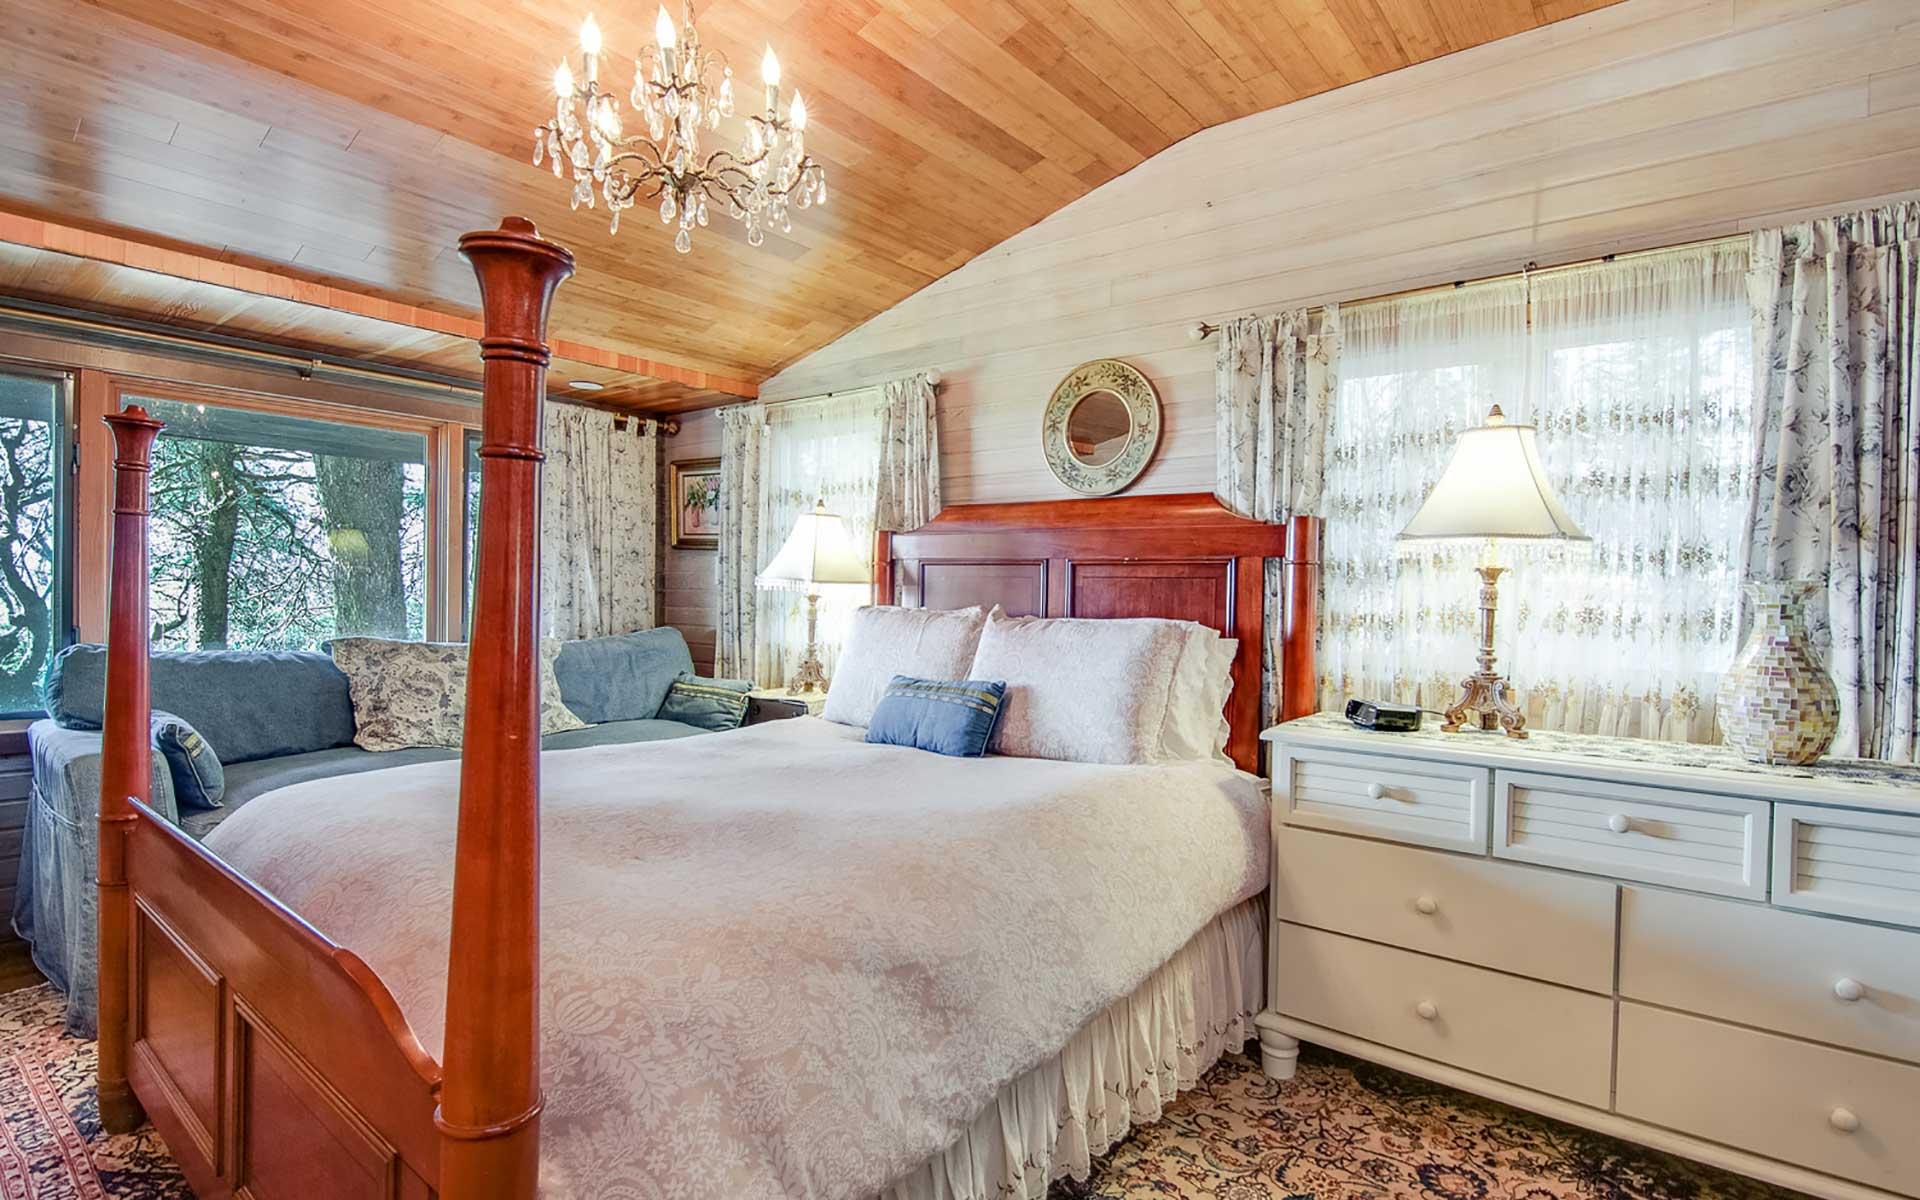 Sweet Coastal Living at this Jewel Box Beach House photo